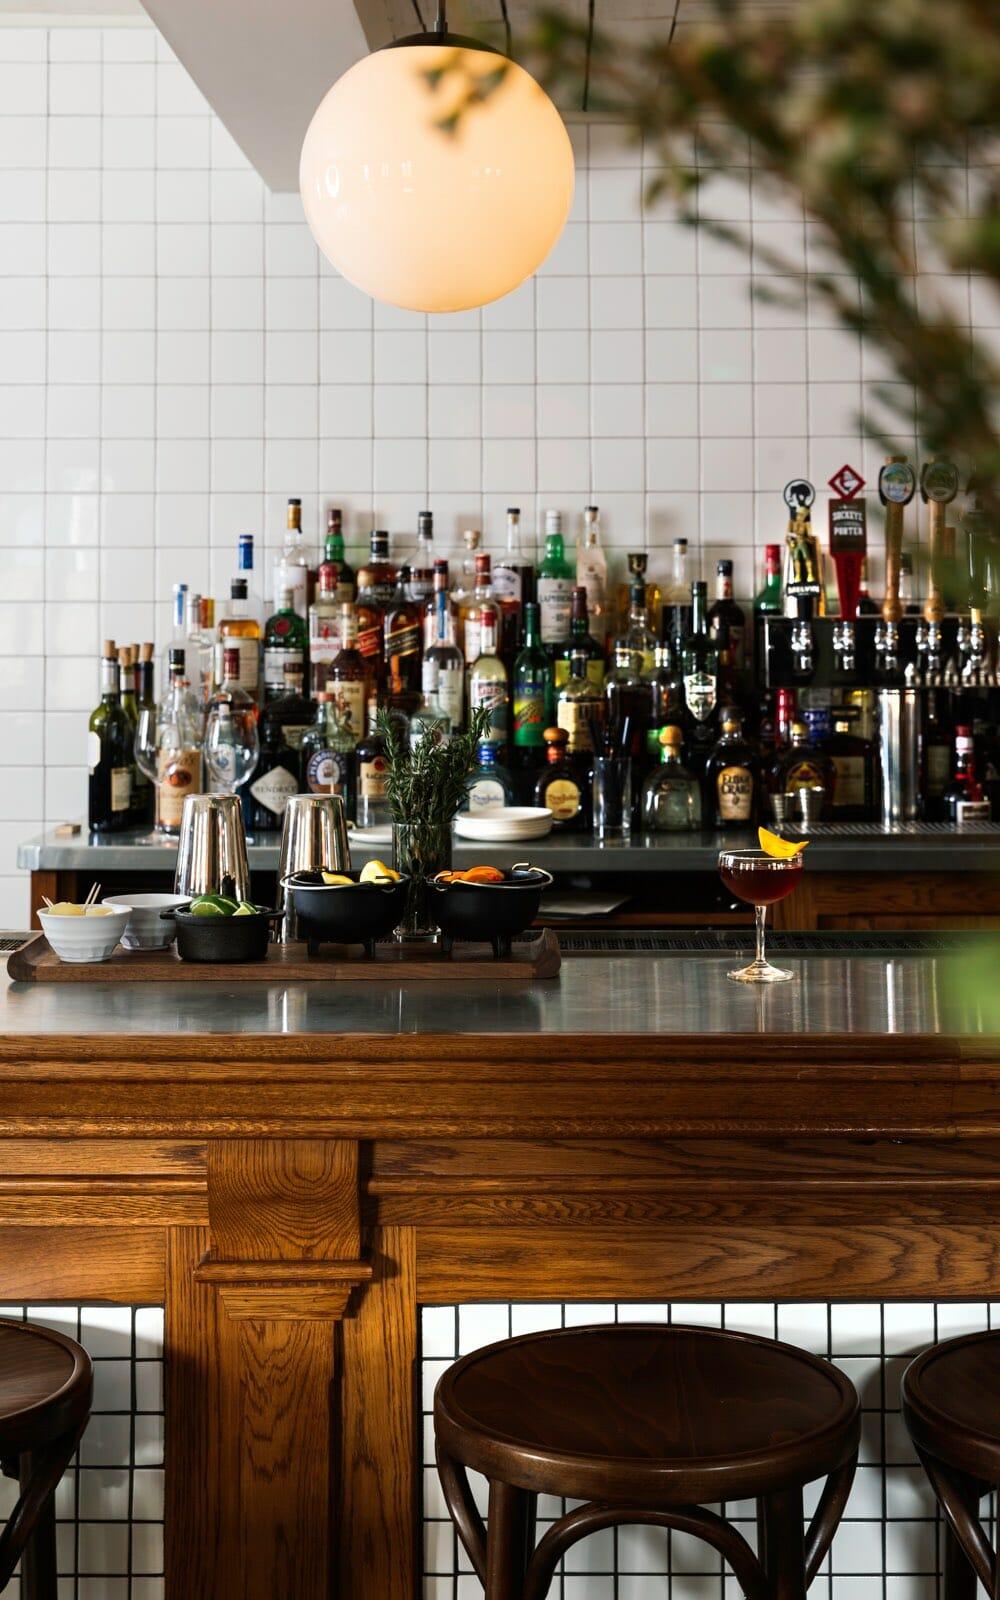 Craft cocktail hotel bar with bottles of premium liquor